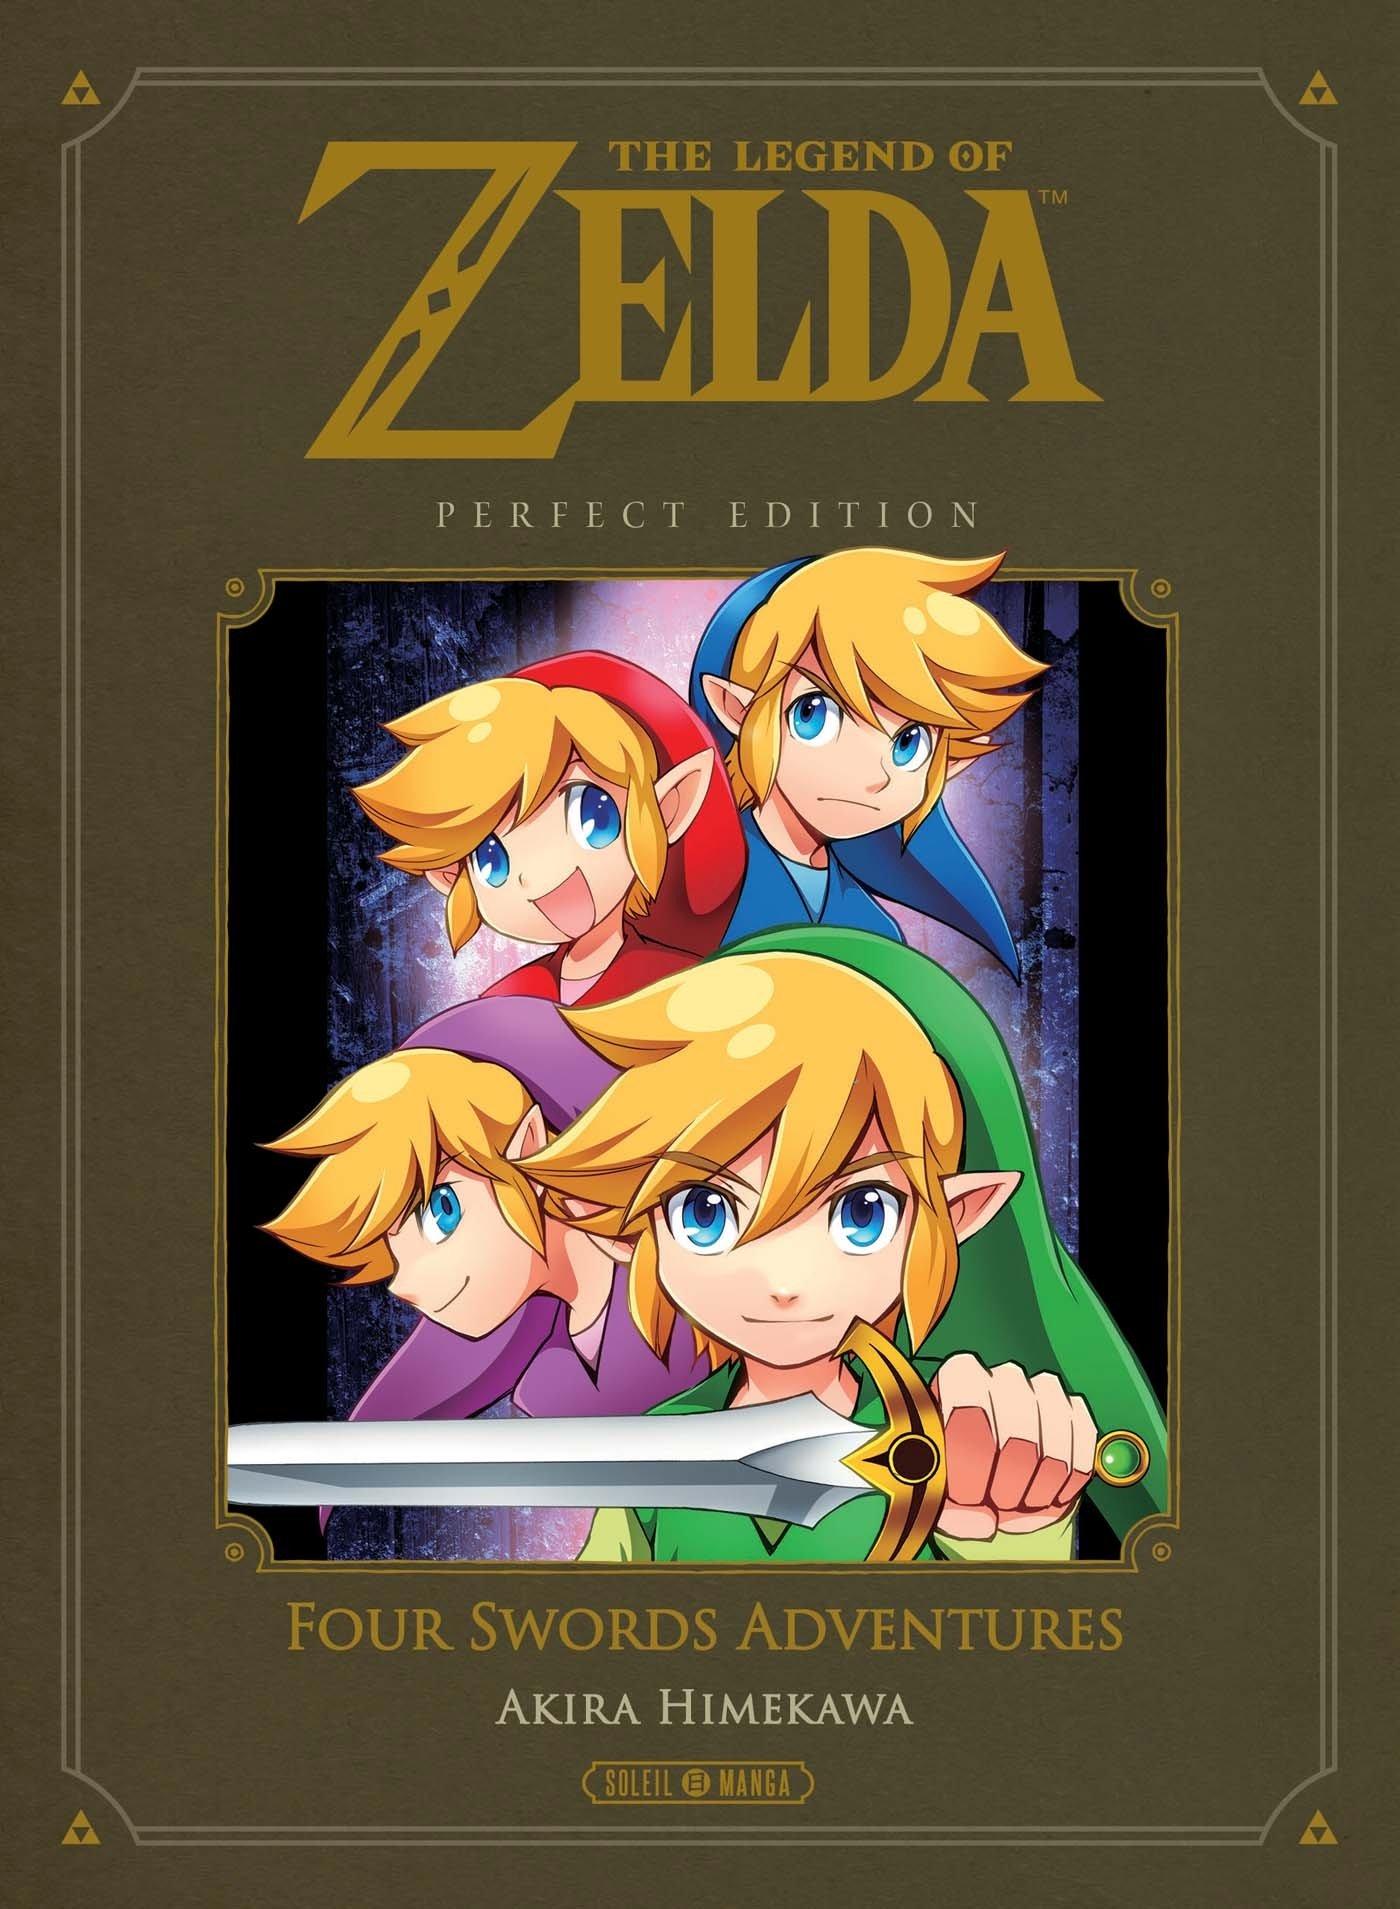 The Legend of Zelda: Four Swords Adventures Manga